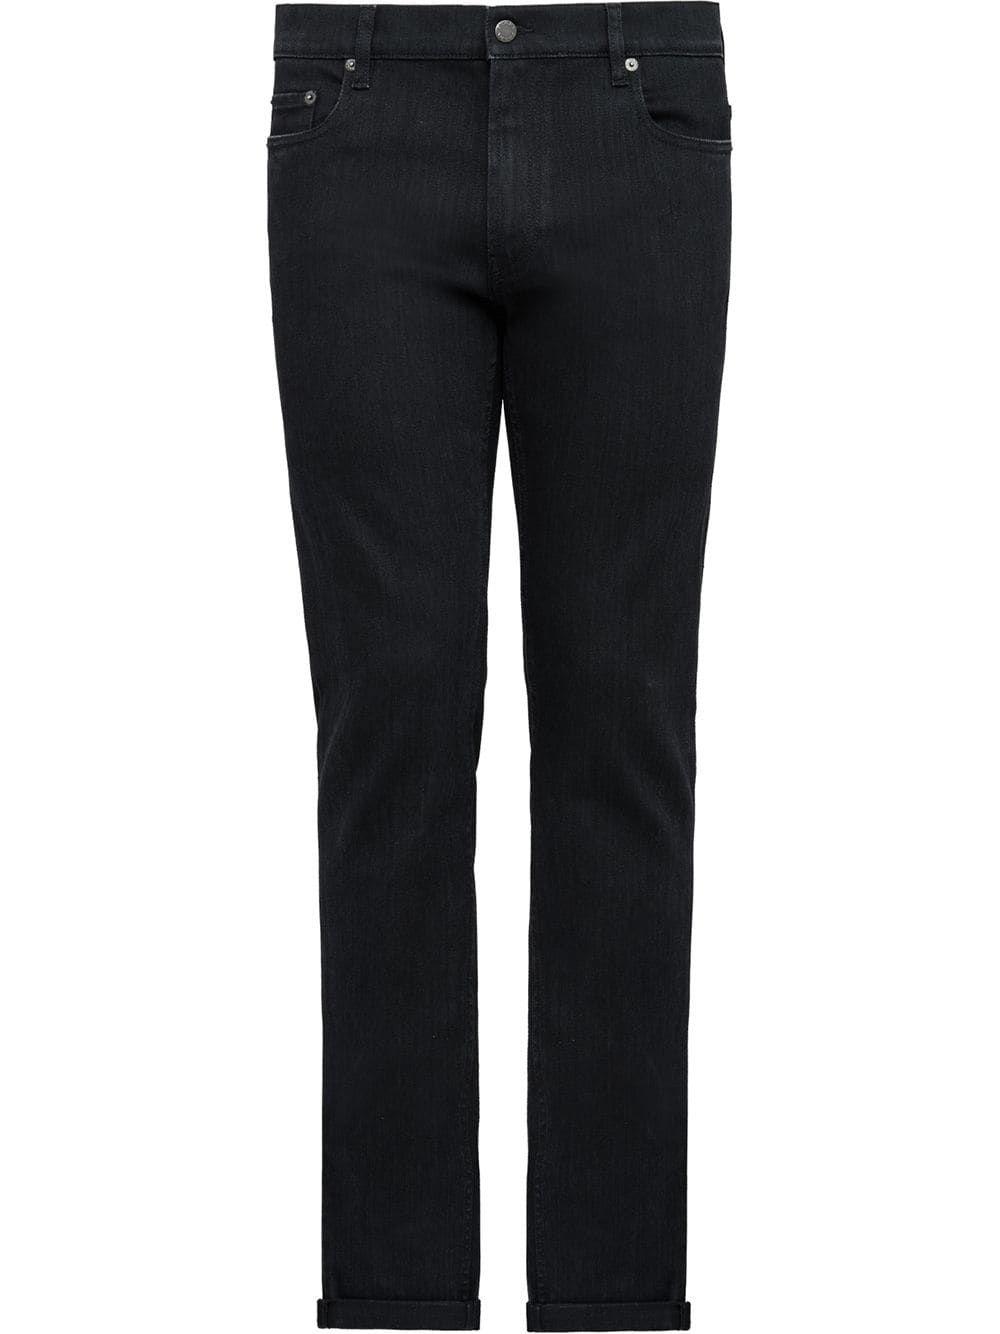 4d110ec9385 PRADA PRADA CLASSIC SKINNY-FIT JEANS - BLACK.  prada  cloth